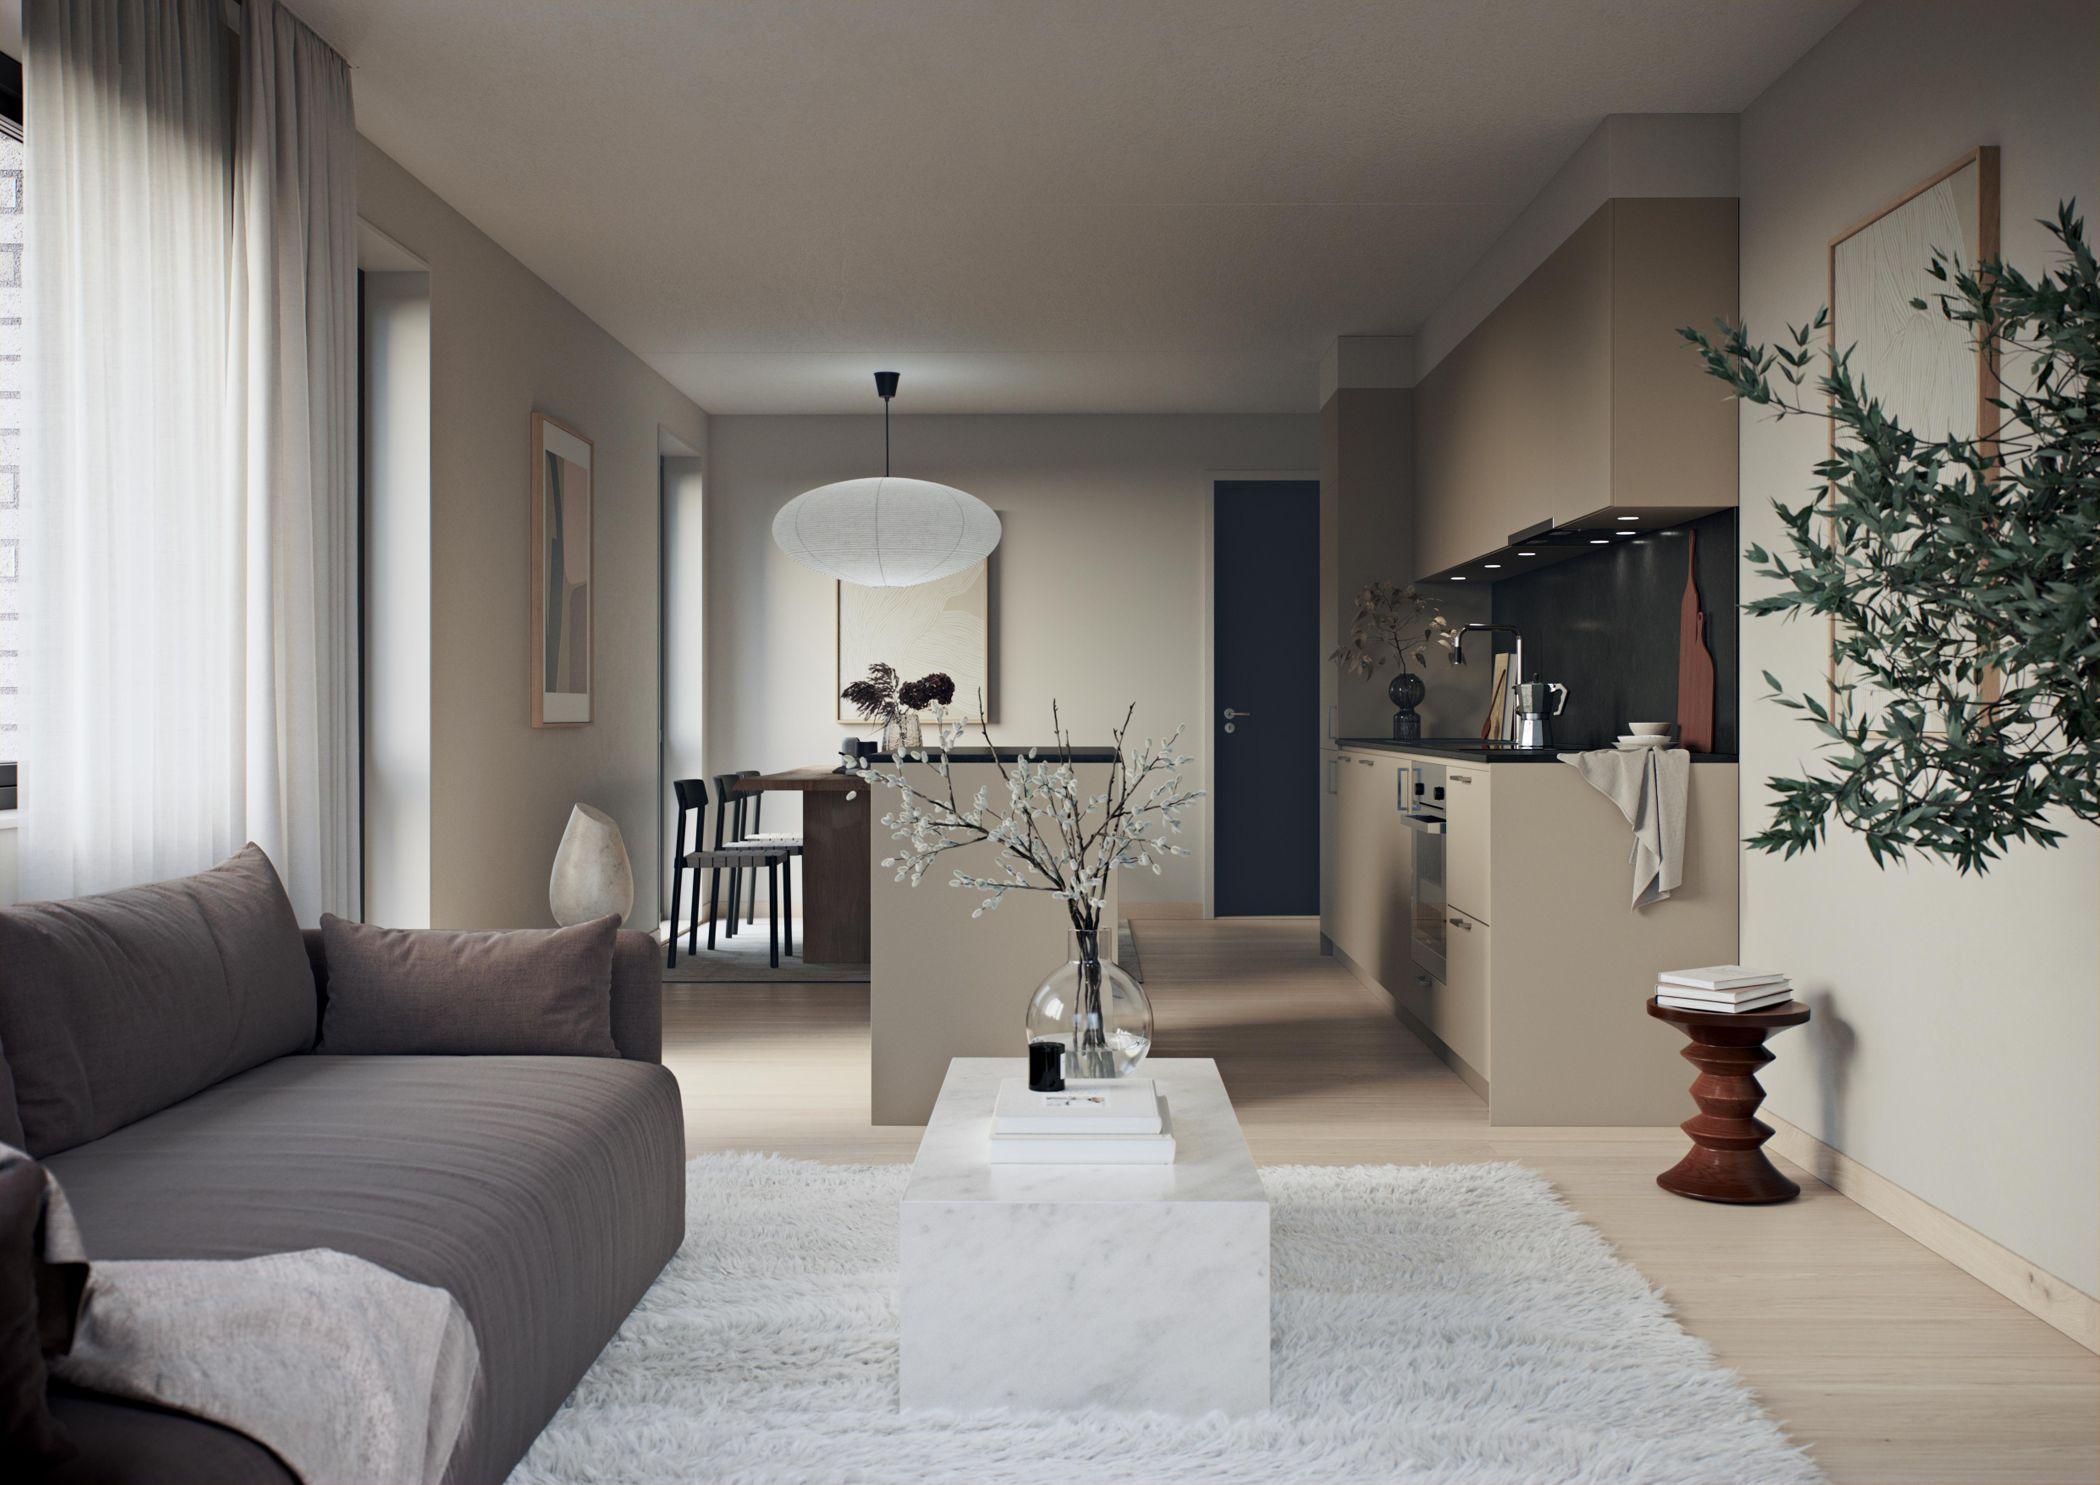 Arnljot_Gellines_vei_LA1105_Livingroom2.jpg